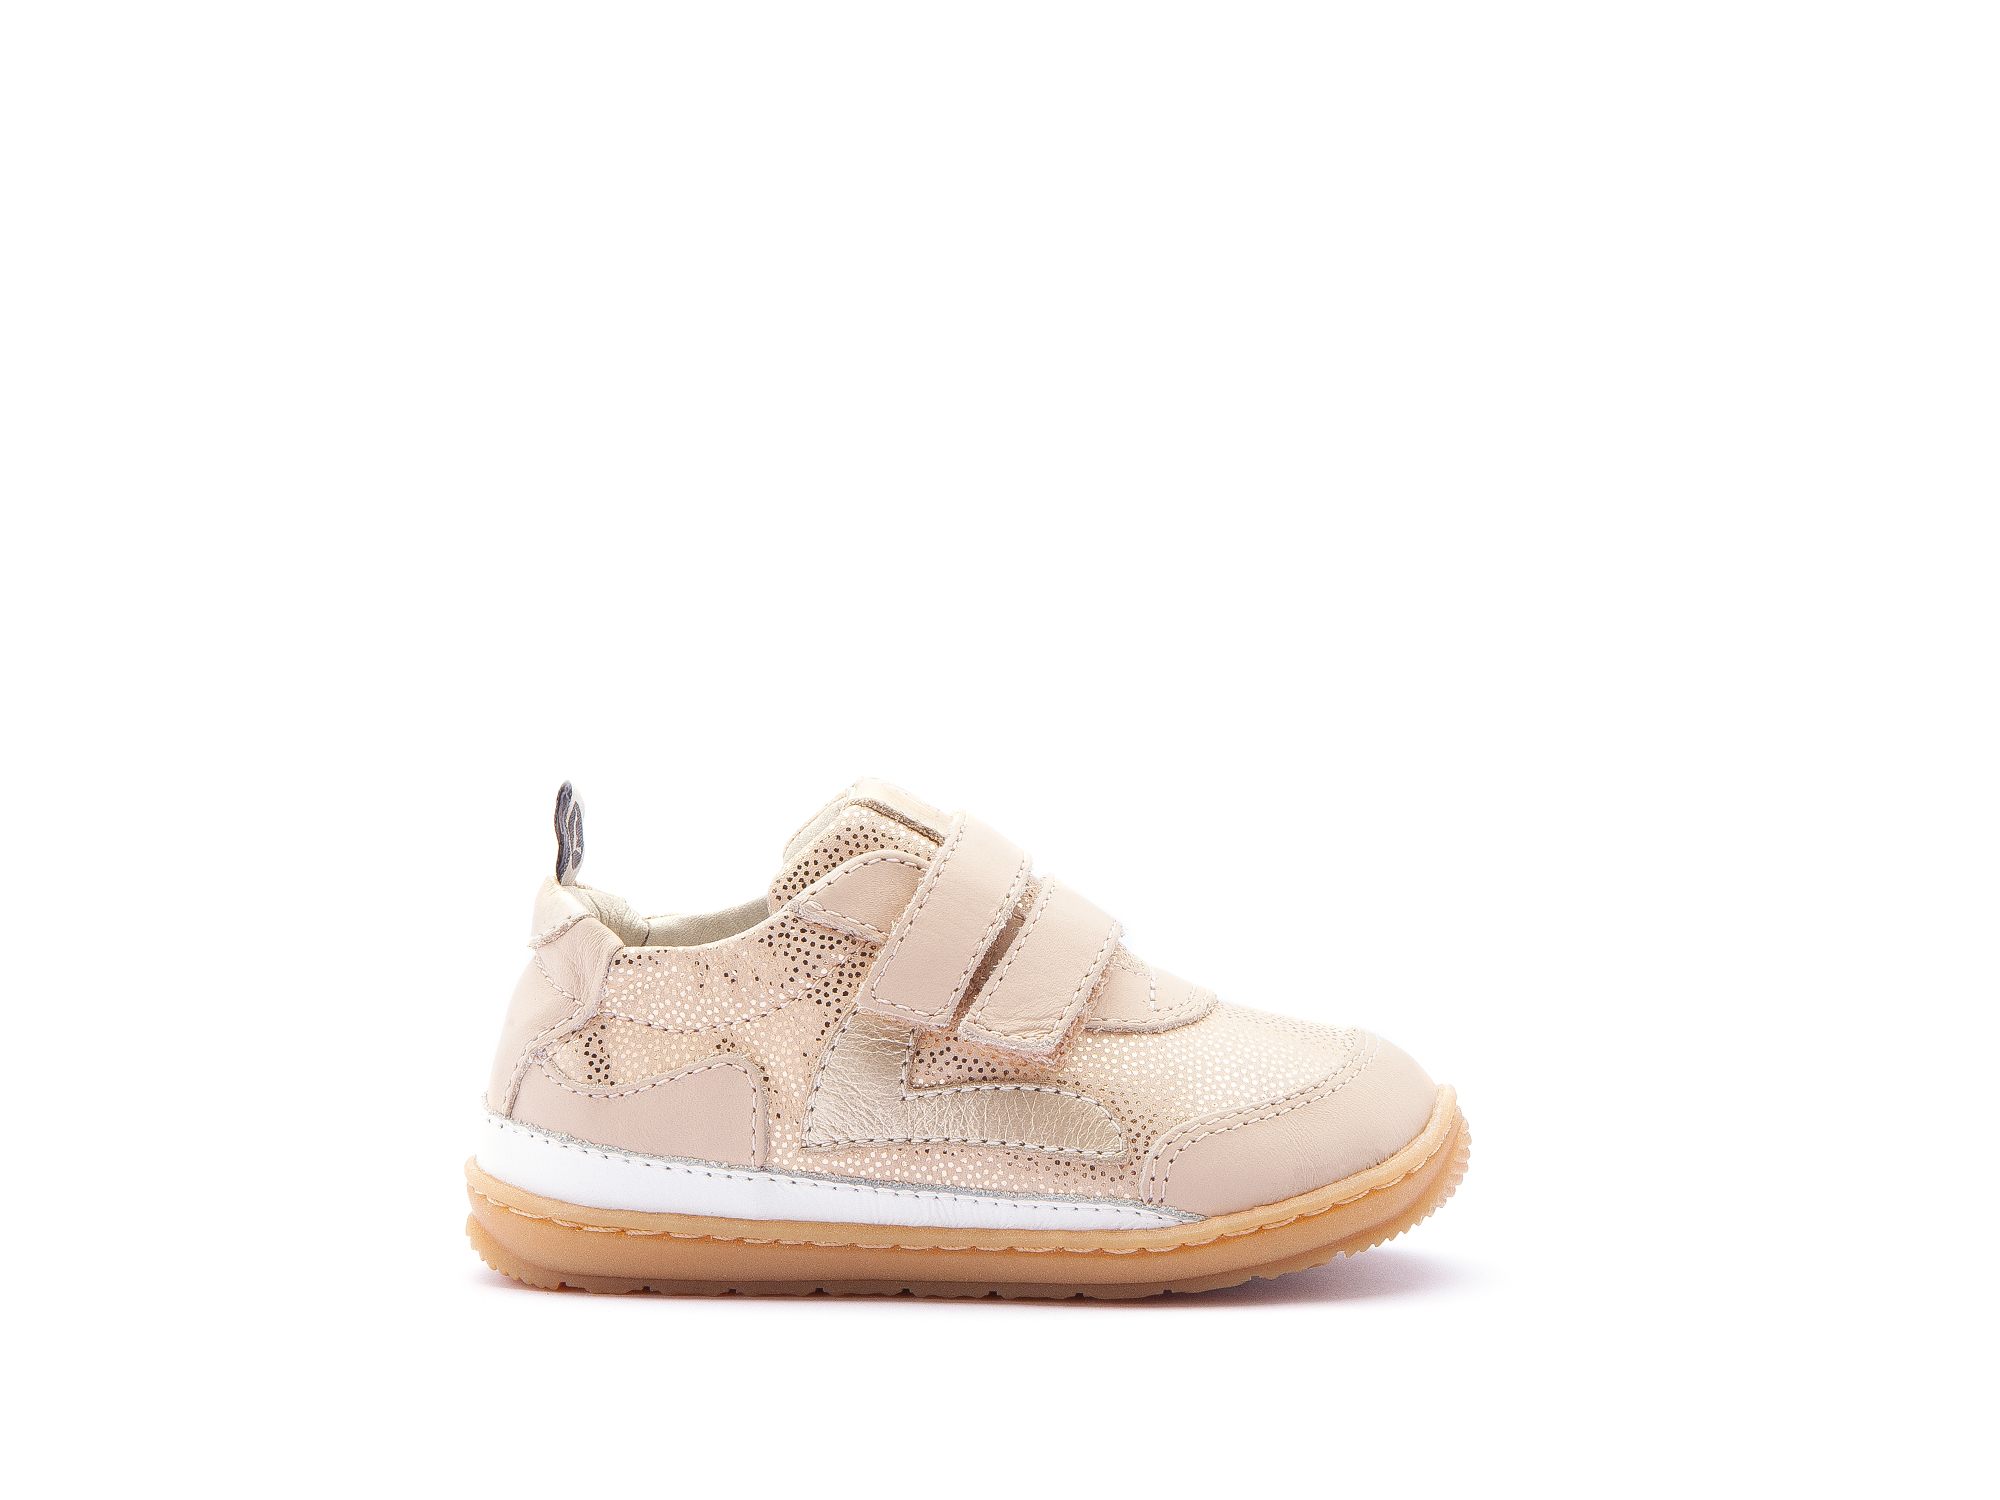 Sneaker Casual Jumpy Golden Sugar/ Yogurt Baby 0 à 2 anos - 1